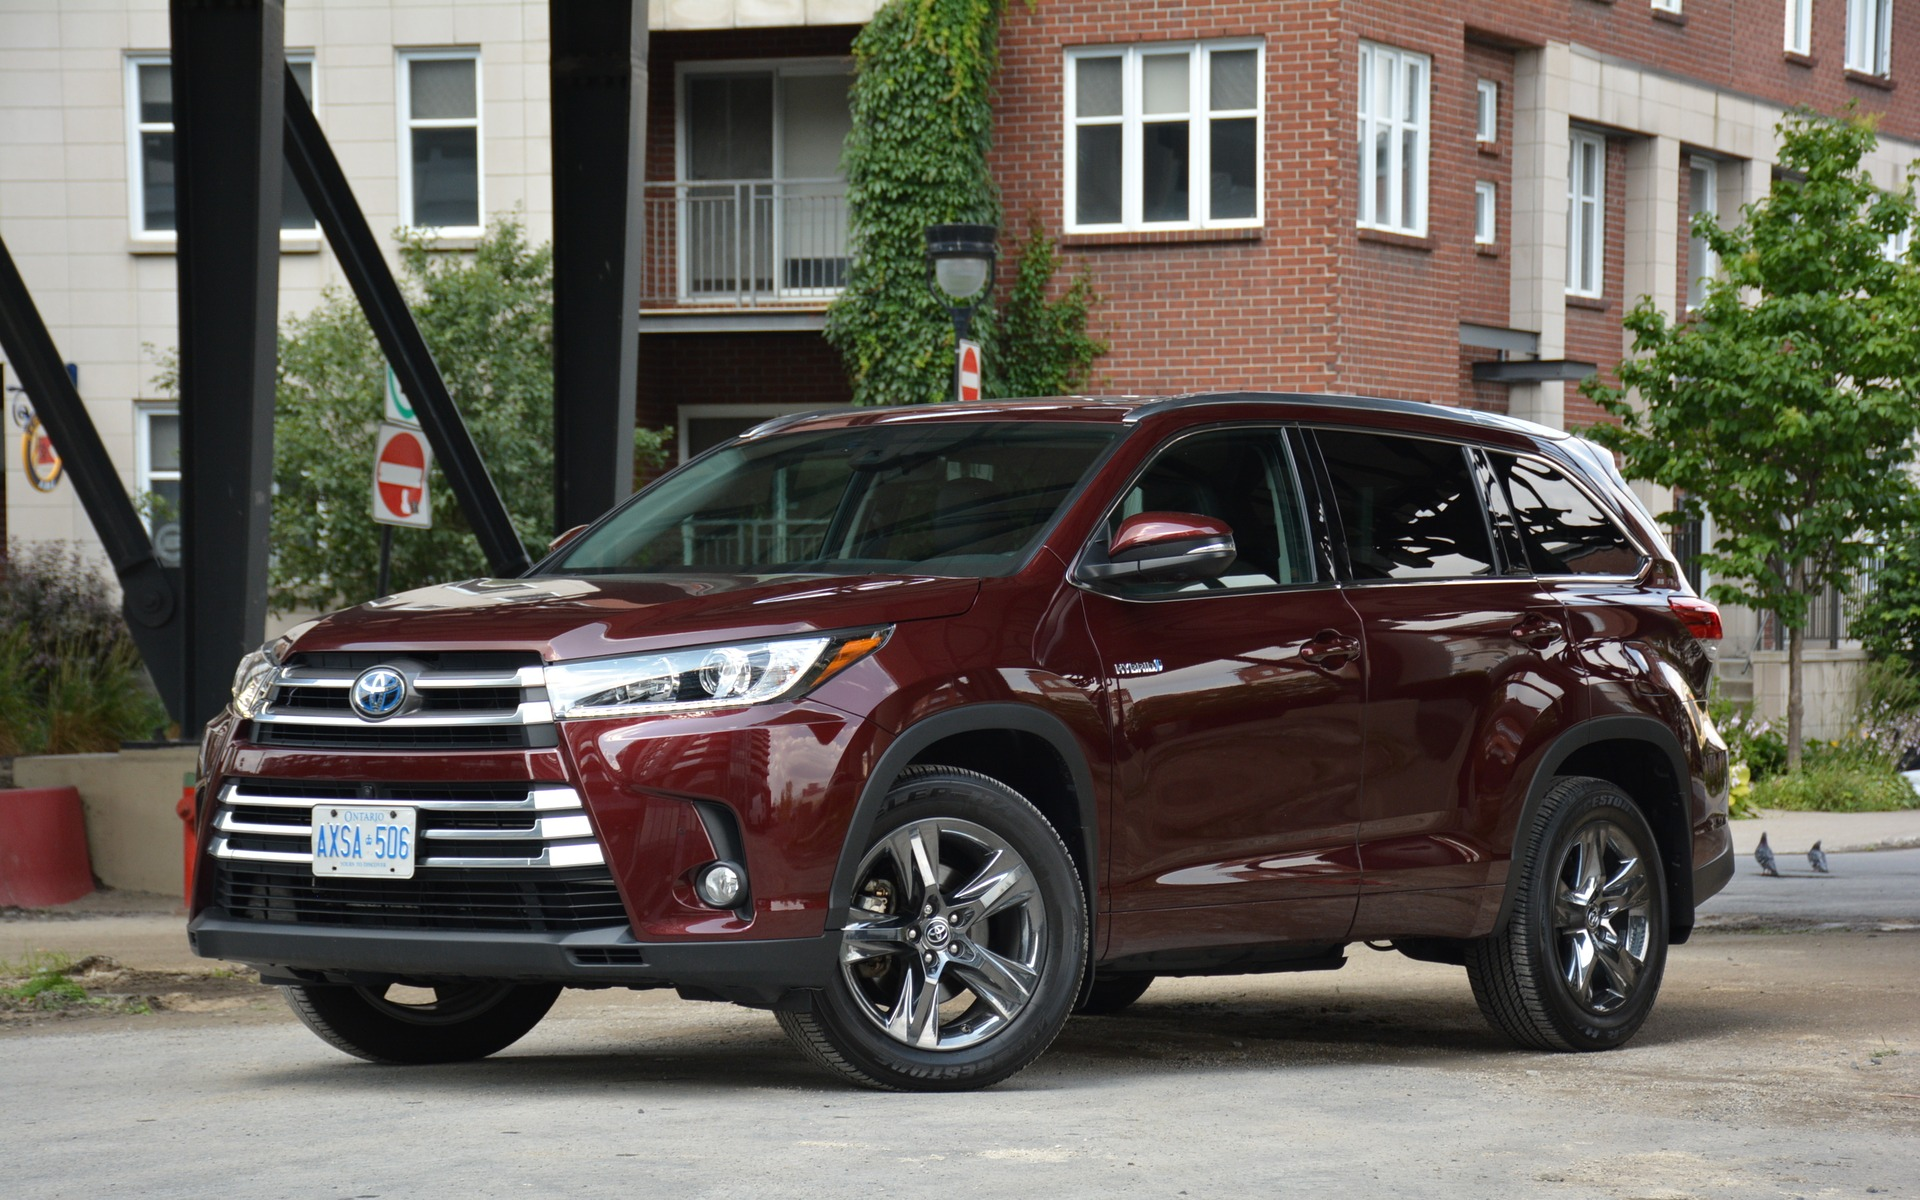 2017 Toyota Highlander Hybrid: Checks all the Boxes - 6/24